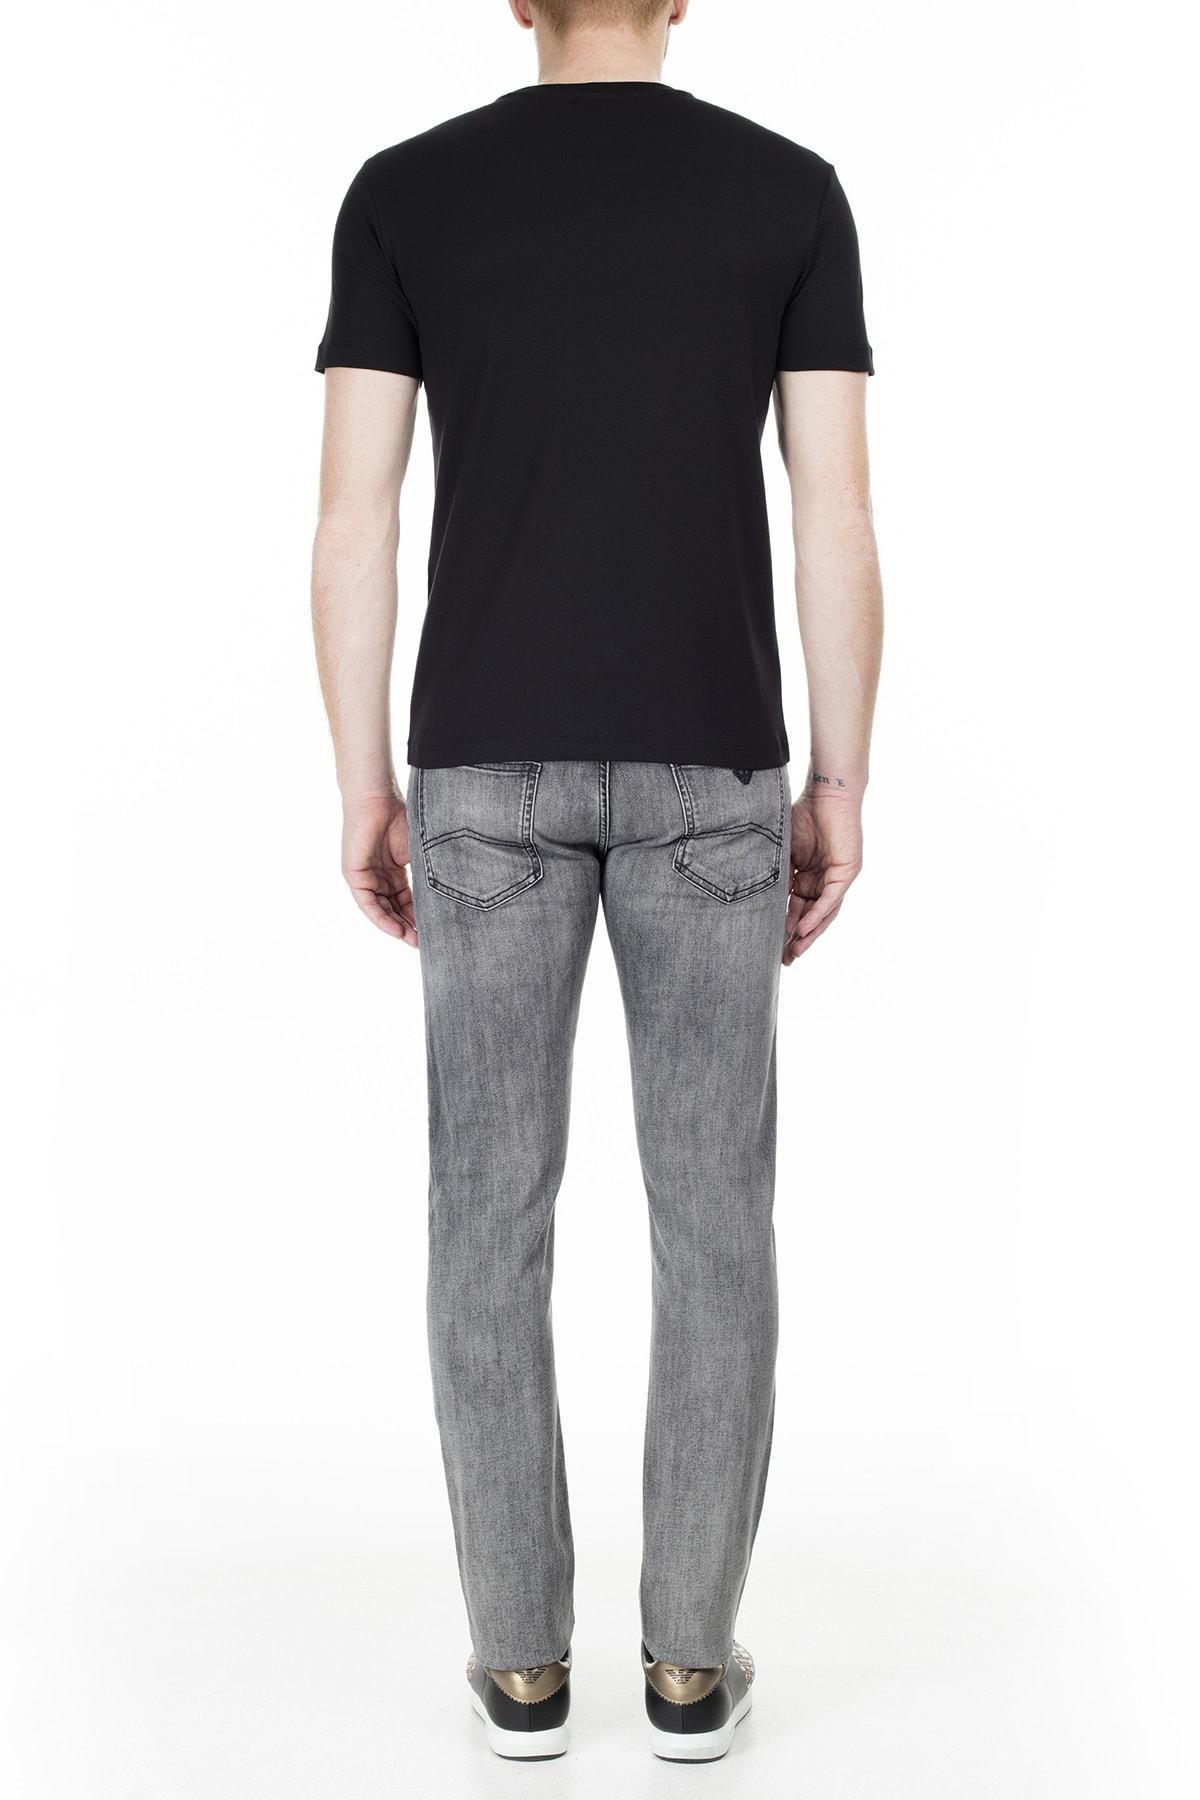 Emporio Armani J10 Jeans Erkek Kot Pantolon S 6G1J10 1D6Mz 0644 S 6G1J10 1D6MZ 0644 4